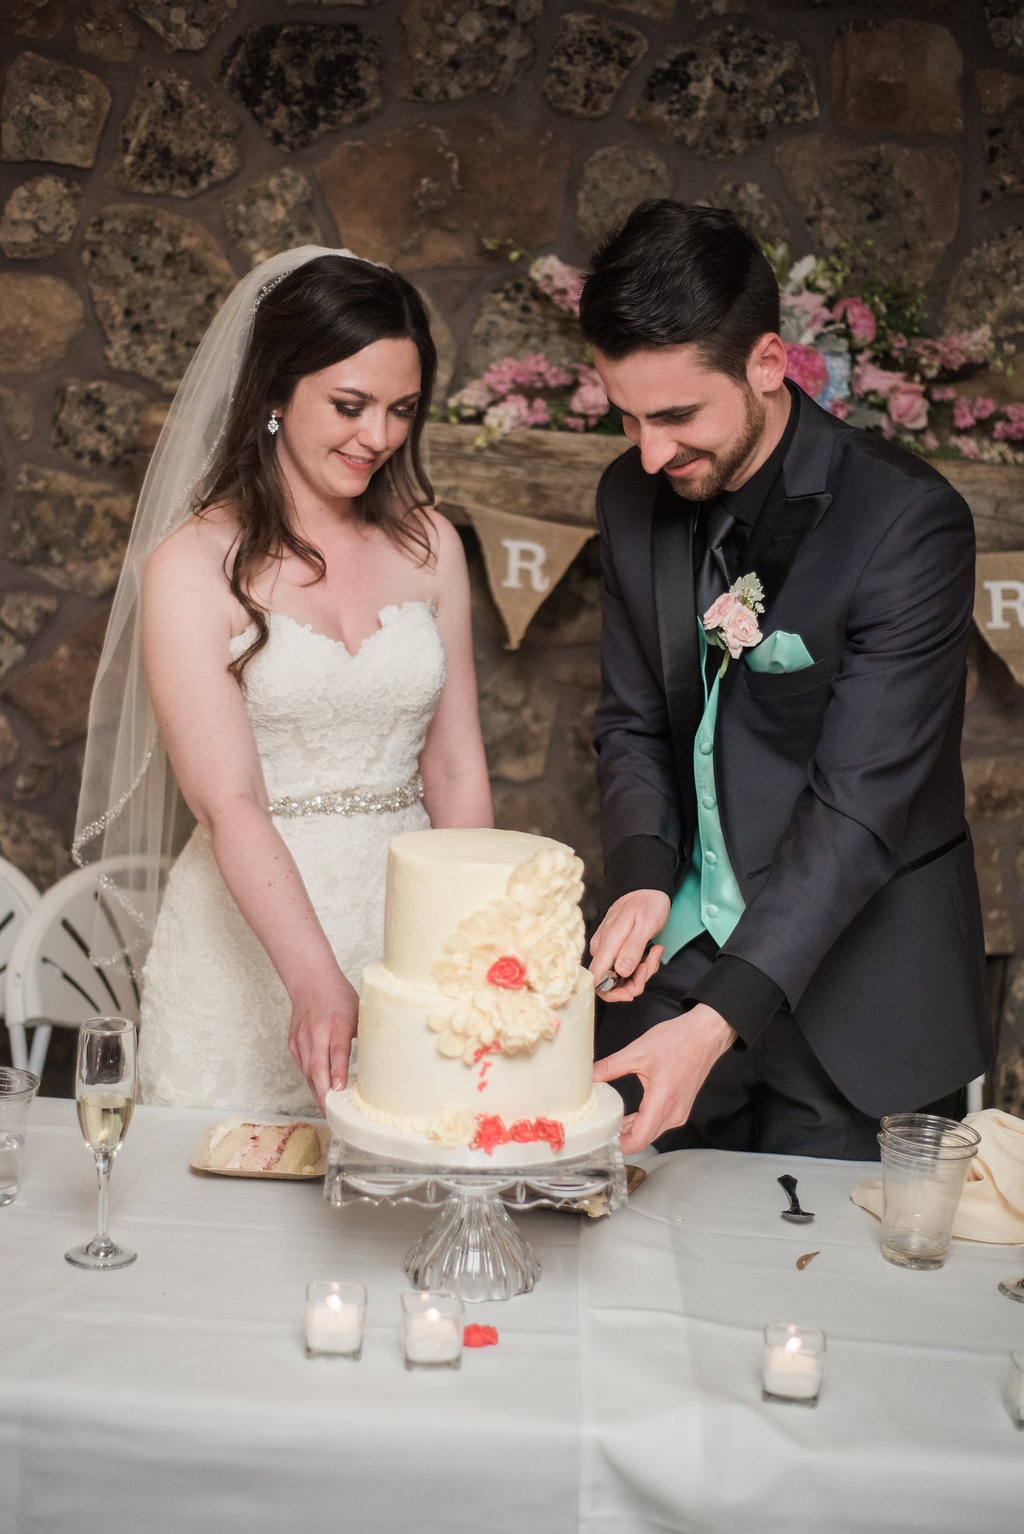 20170527_Roberts_Wedding_0026.jpg